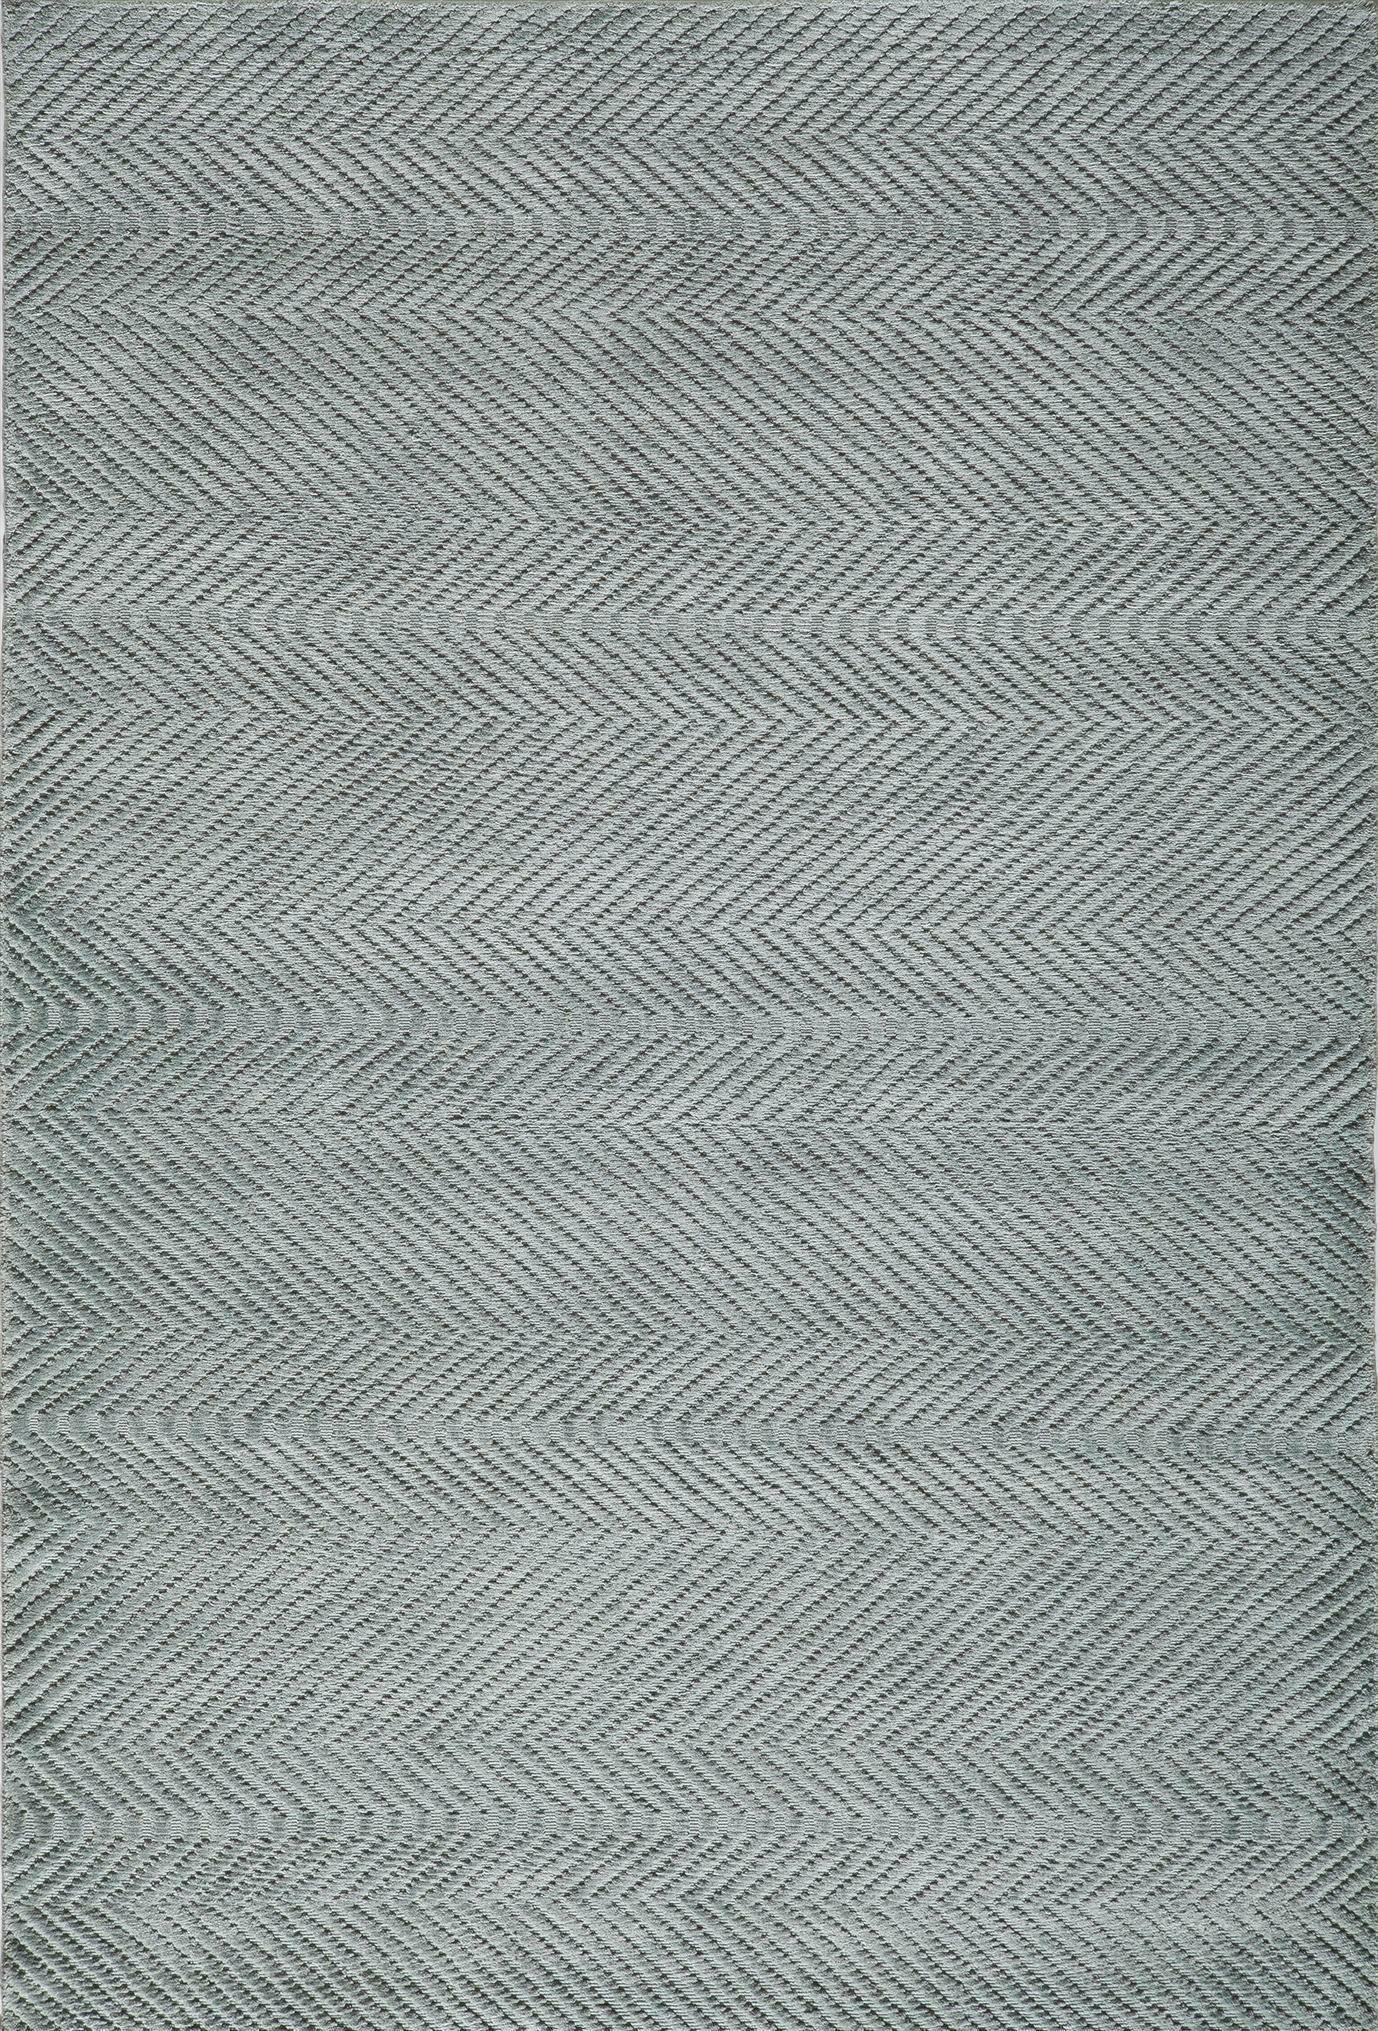 Bridges Hand-LoomedSeafoam Area Rug Rug Size: Rectangle 5' x 8'